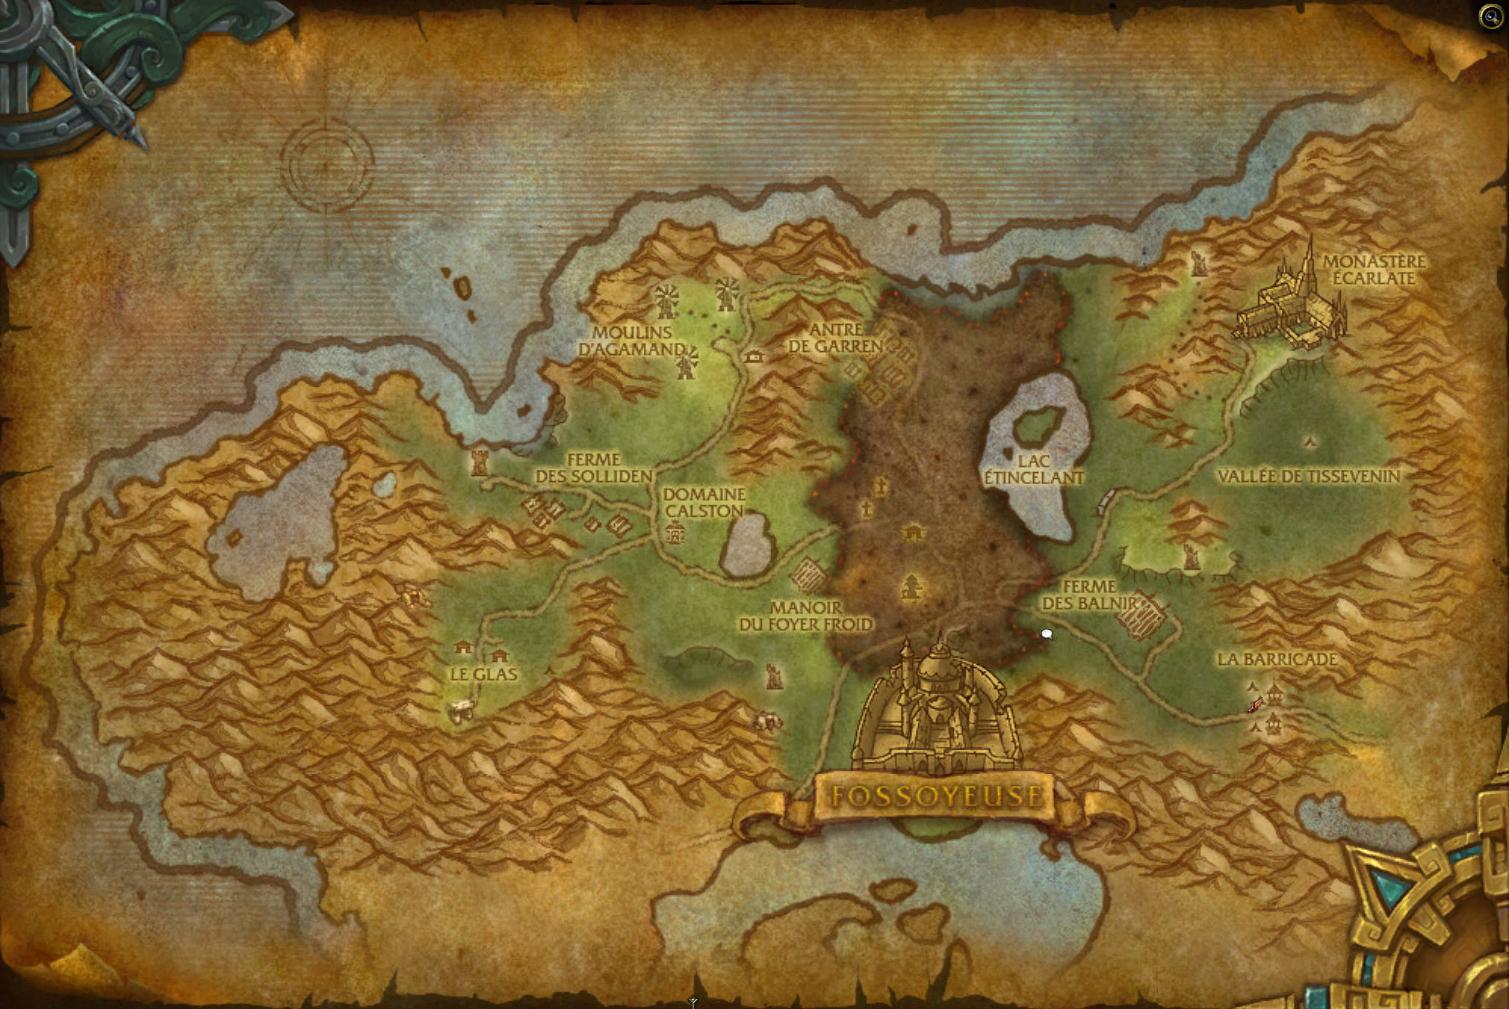 Carte des clairières de Tirisfal